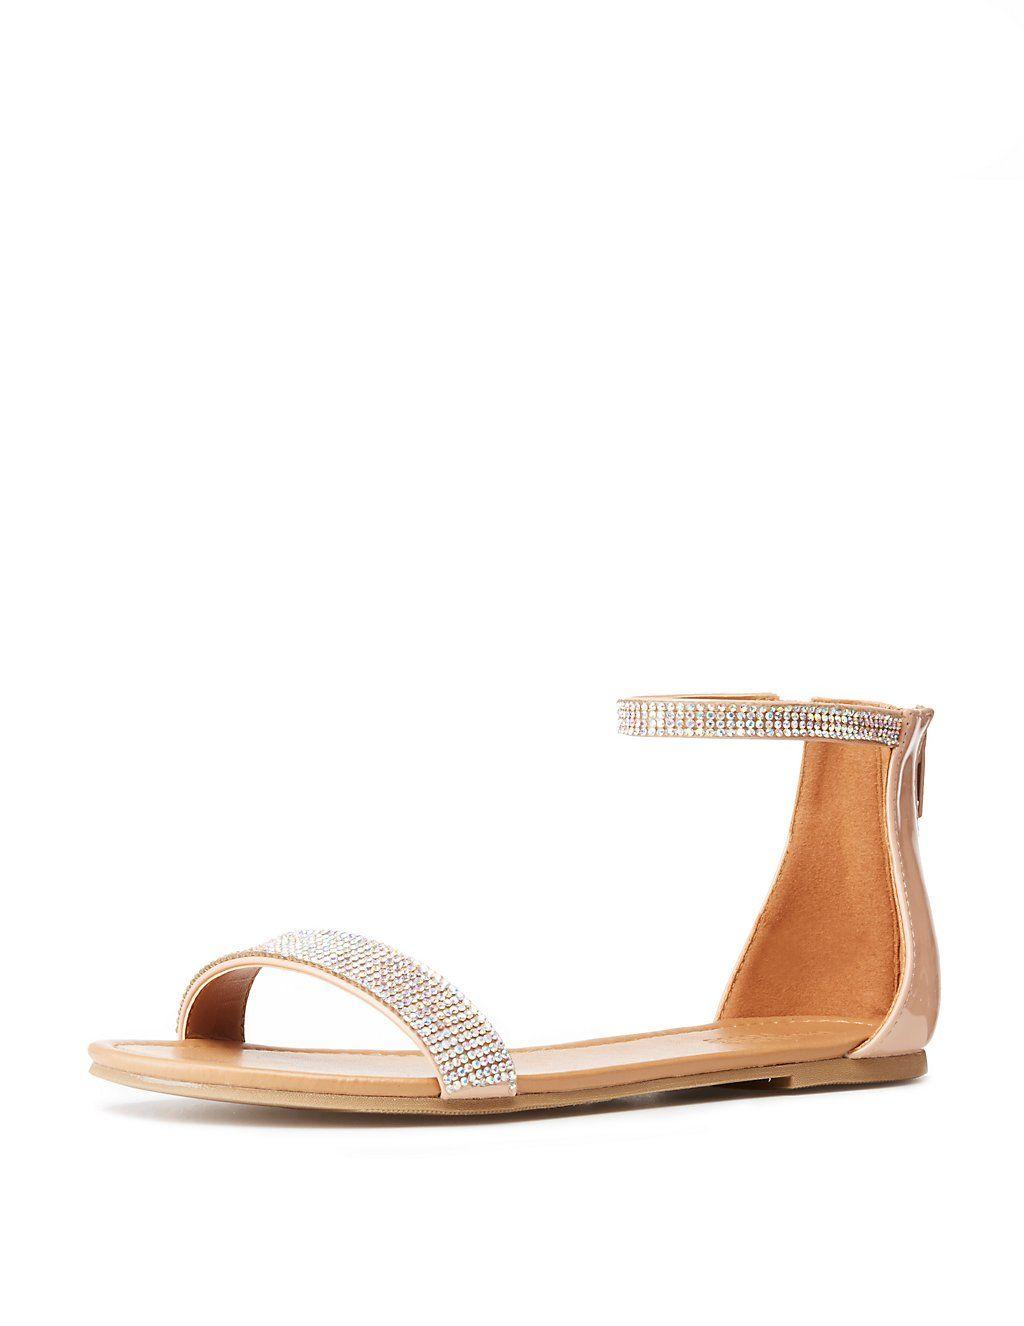 1b1c95c6a83224 Bamboo Rhinestone Ankle Strap Flat Sandals in 2019